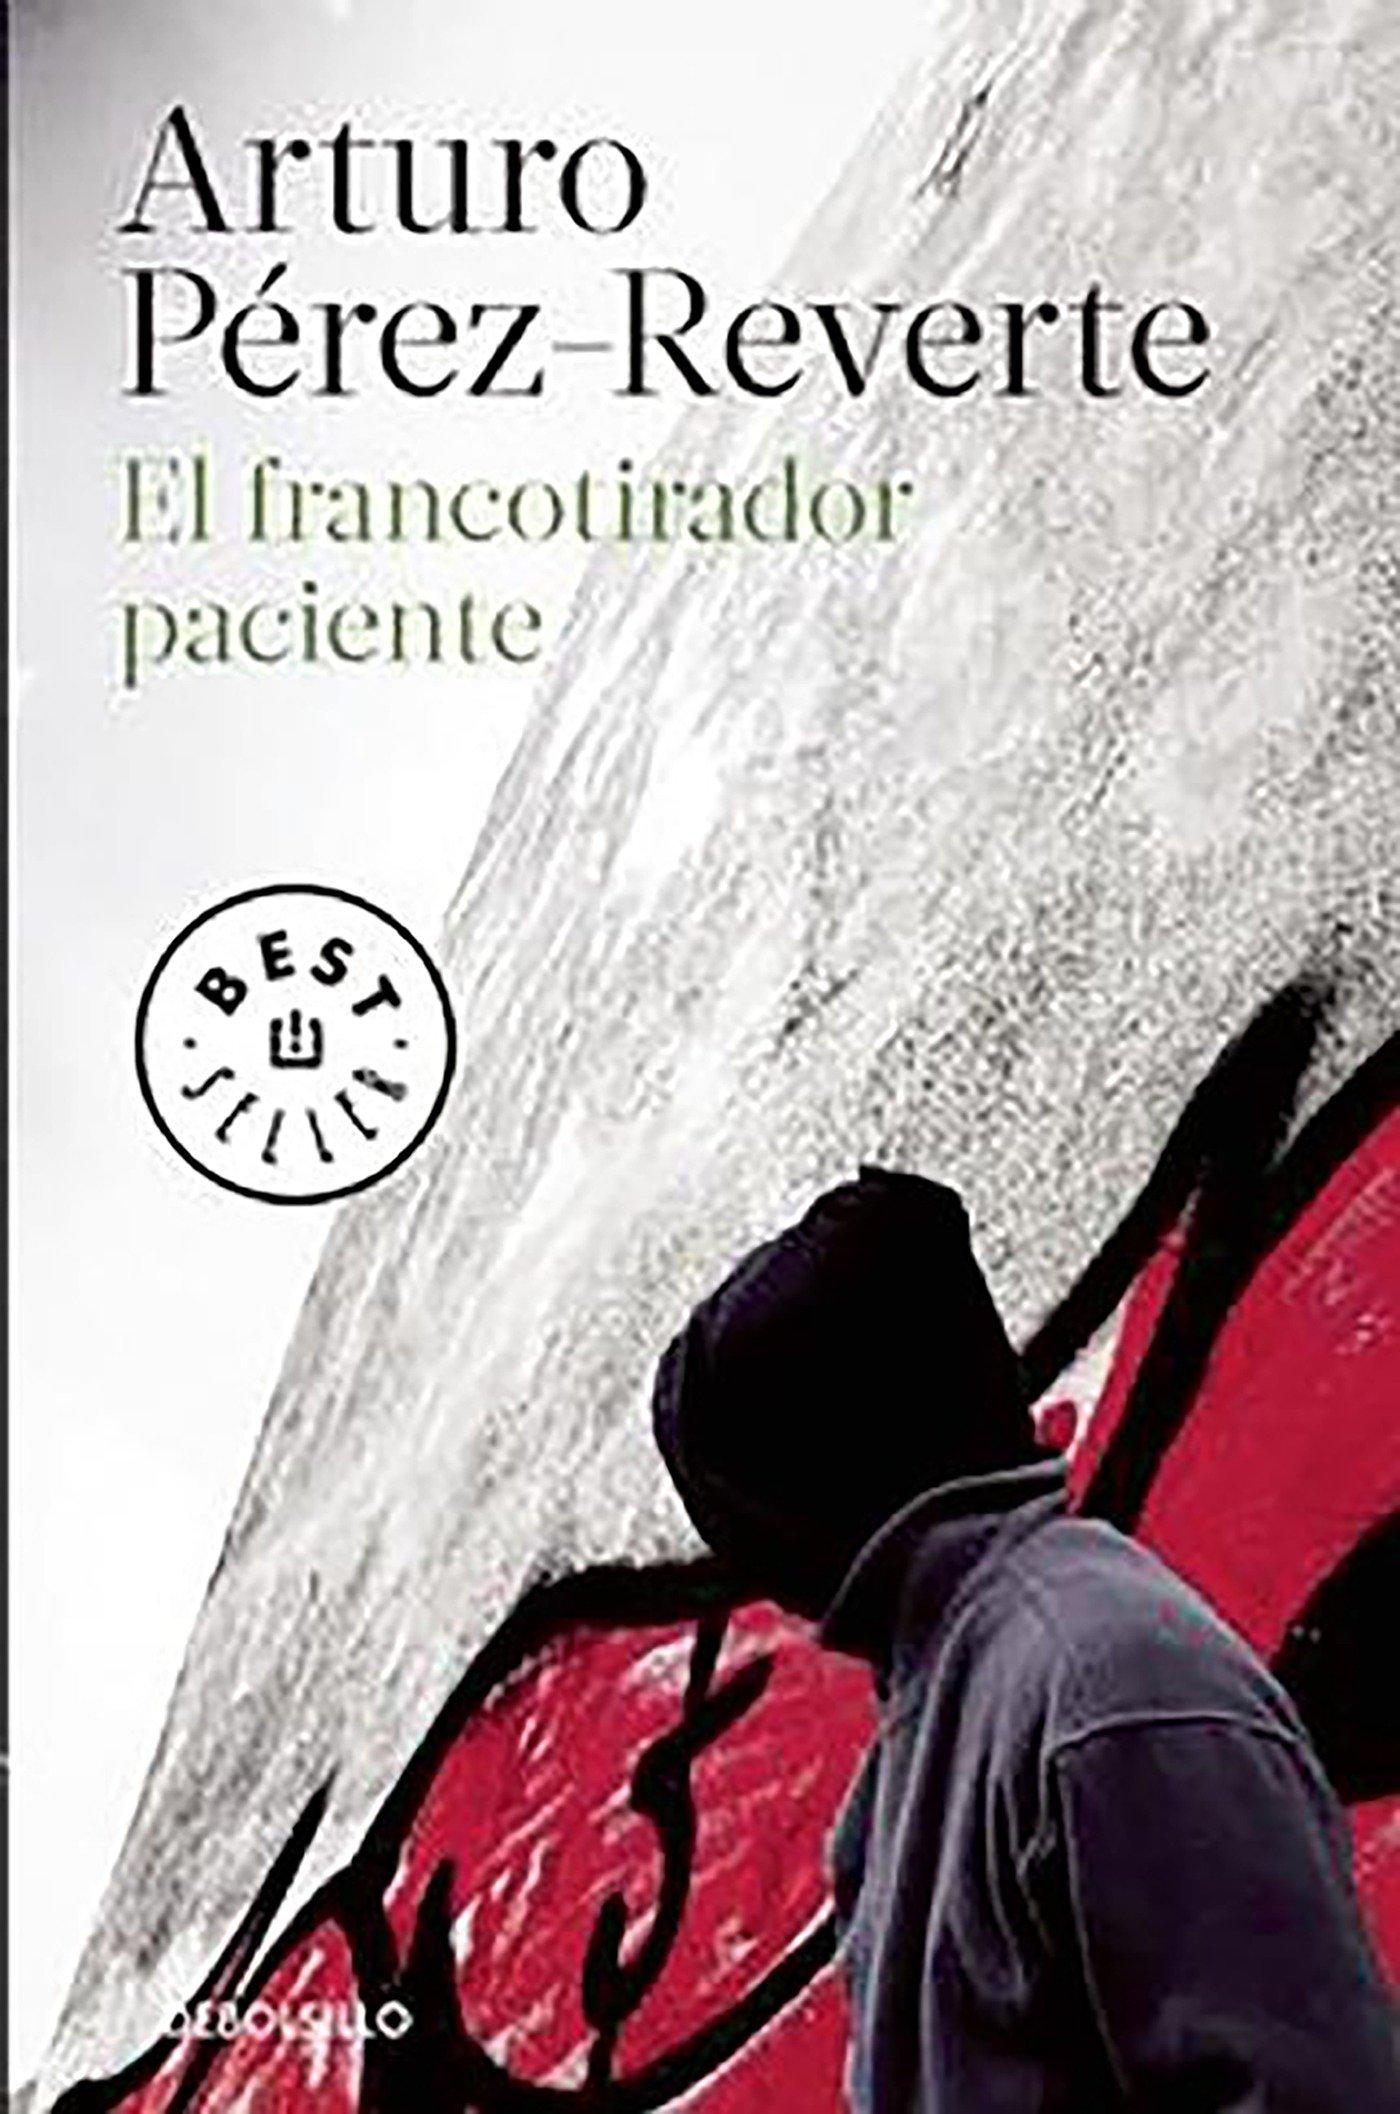 El francotirador paciente (Best Seller): Amazon.es: Pérez-Reverte ...